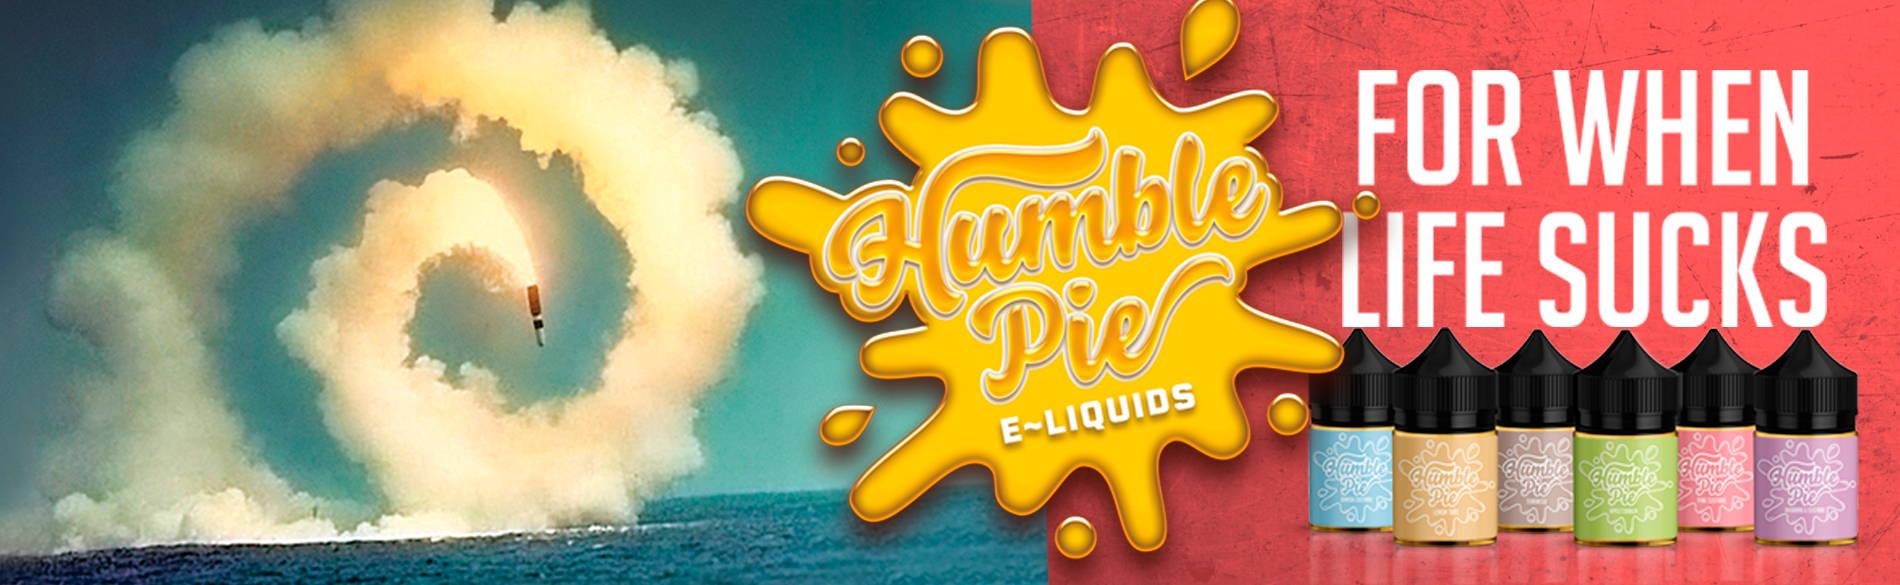 Humble Pie E-liquid range banner - for when life sucks